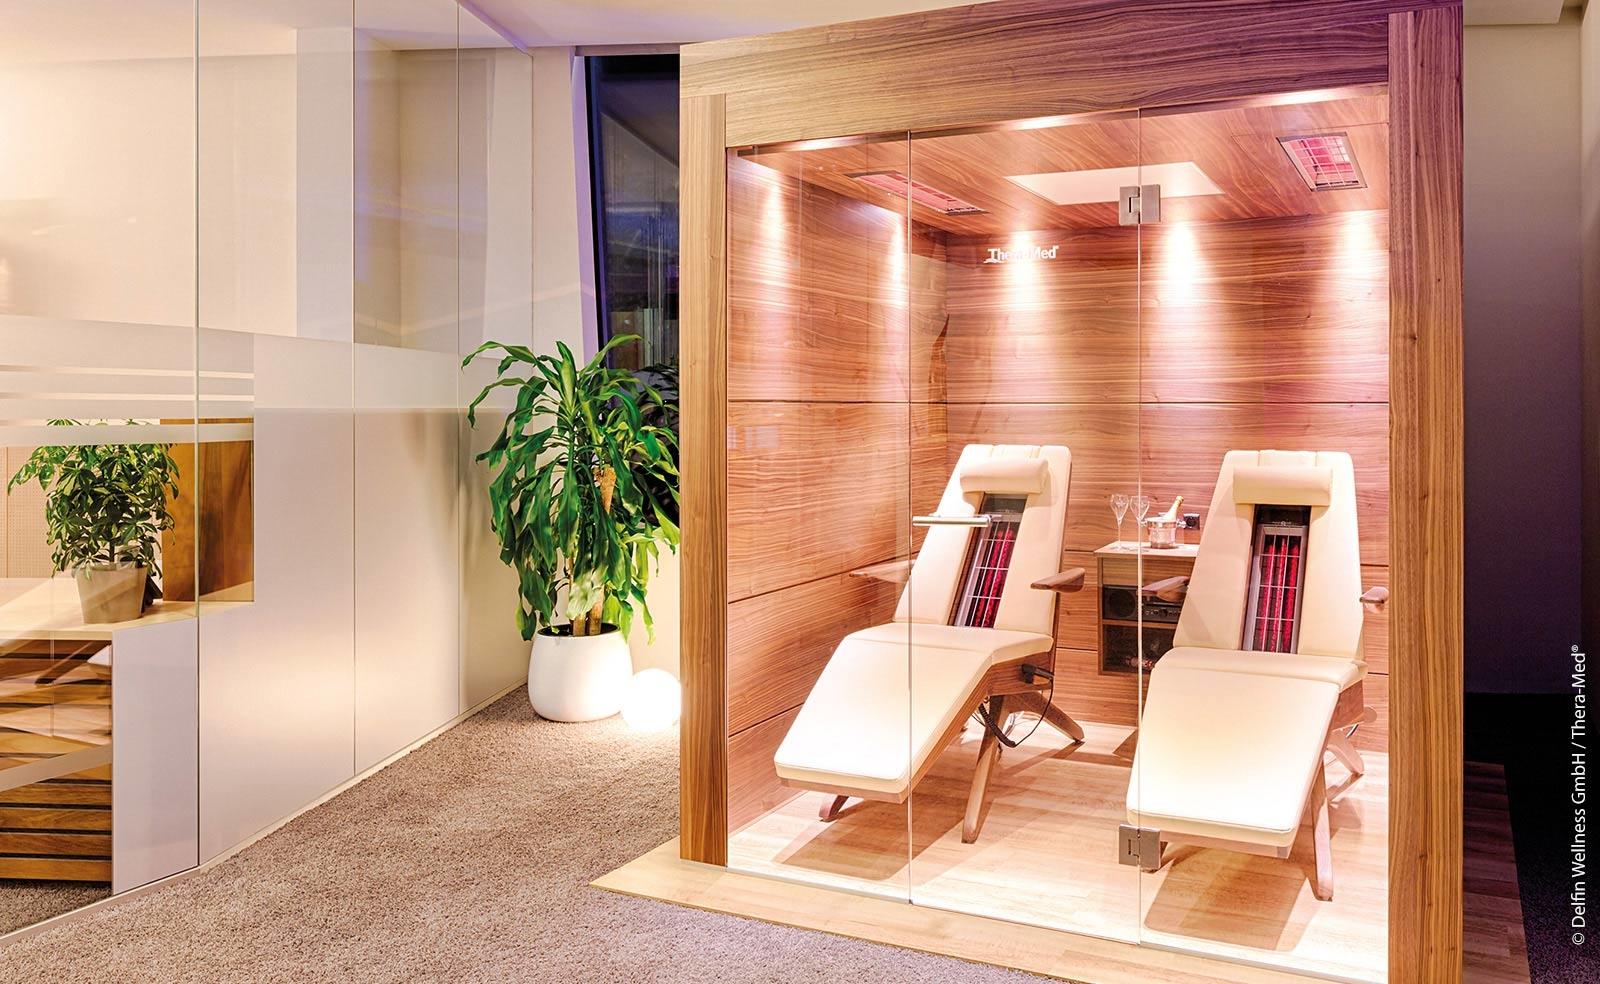 starke gmbh schwimmbad sauna wellness sauna in n rnberg boxdorfer hauptstra e 12. Black Bedroom Furniture Sets. Home Design Ideas